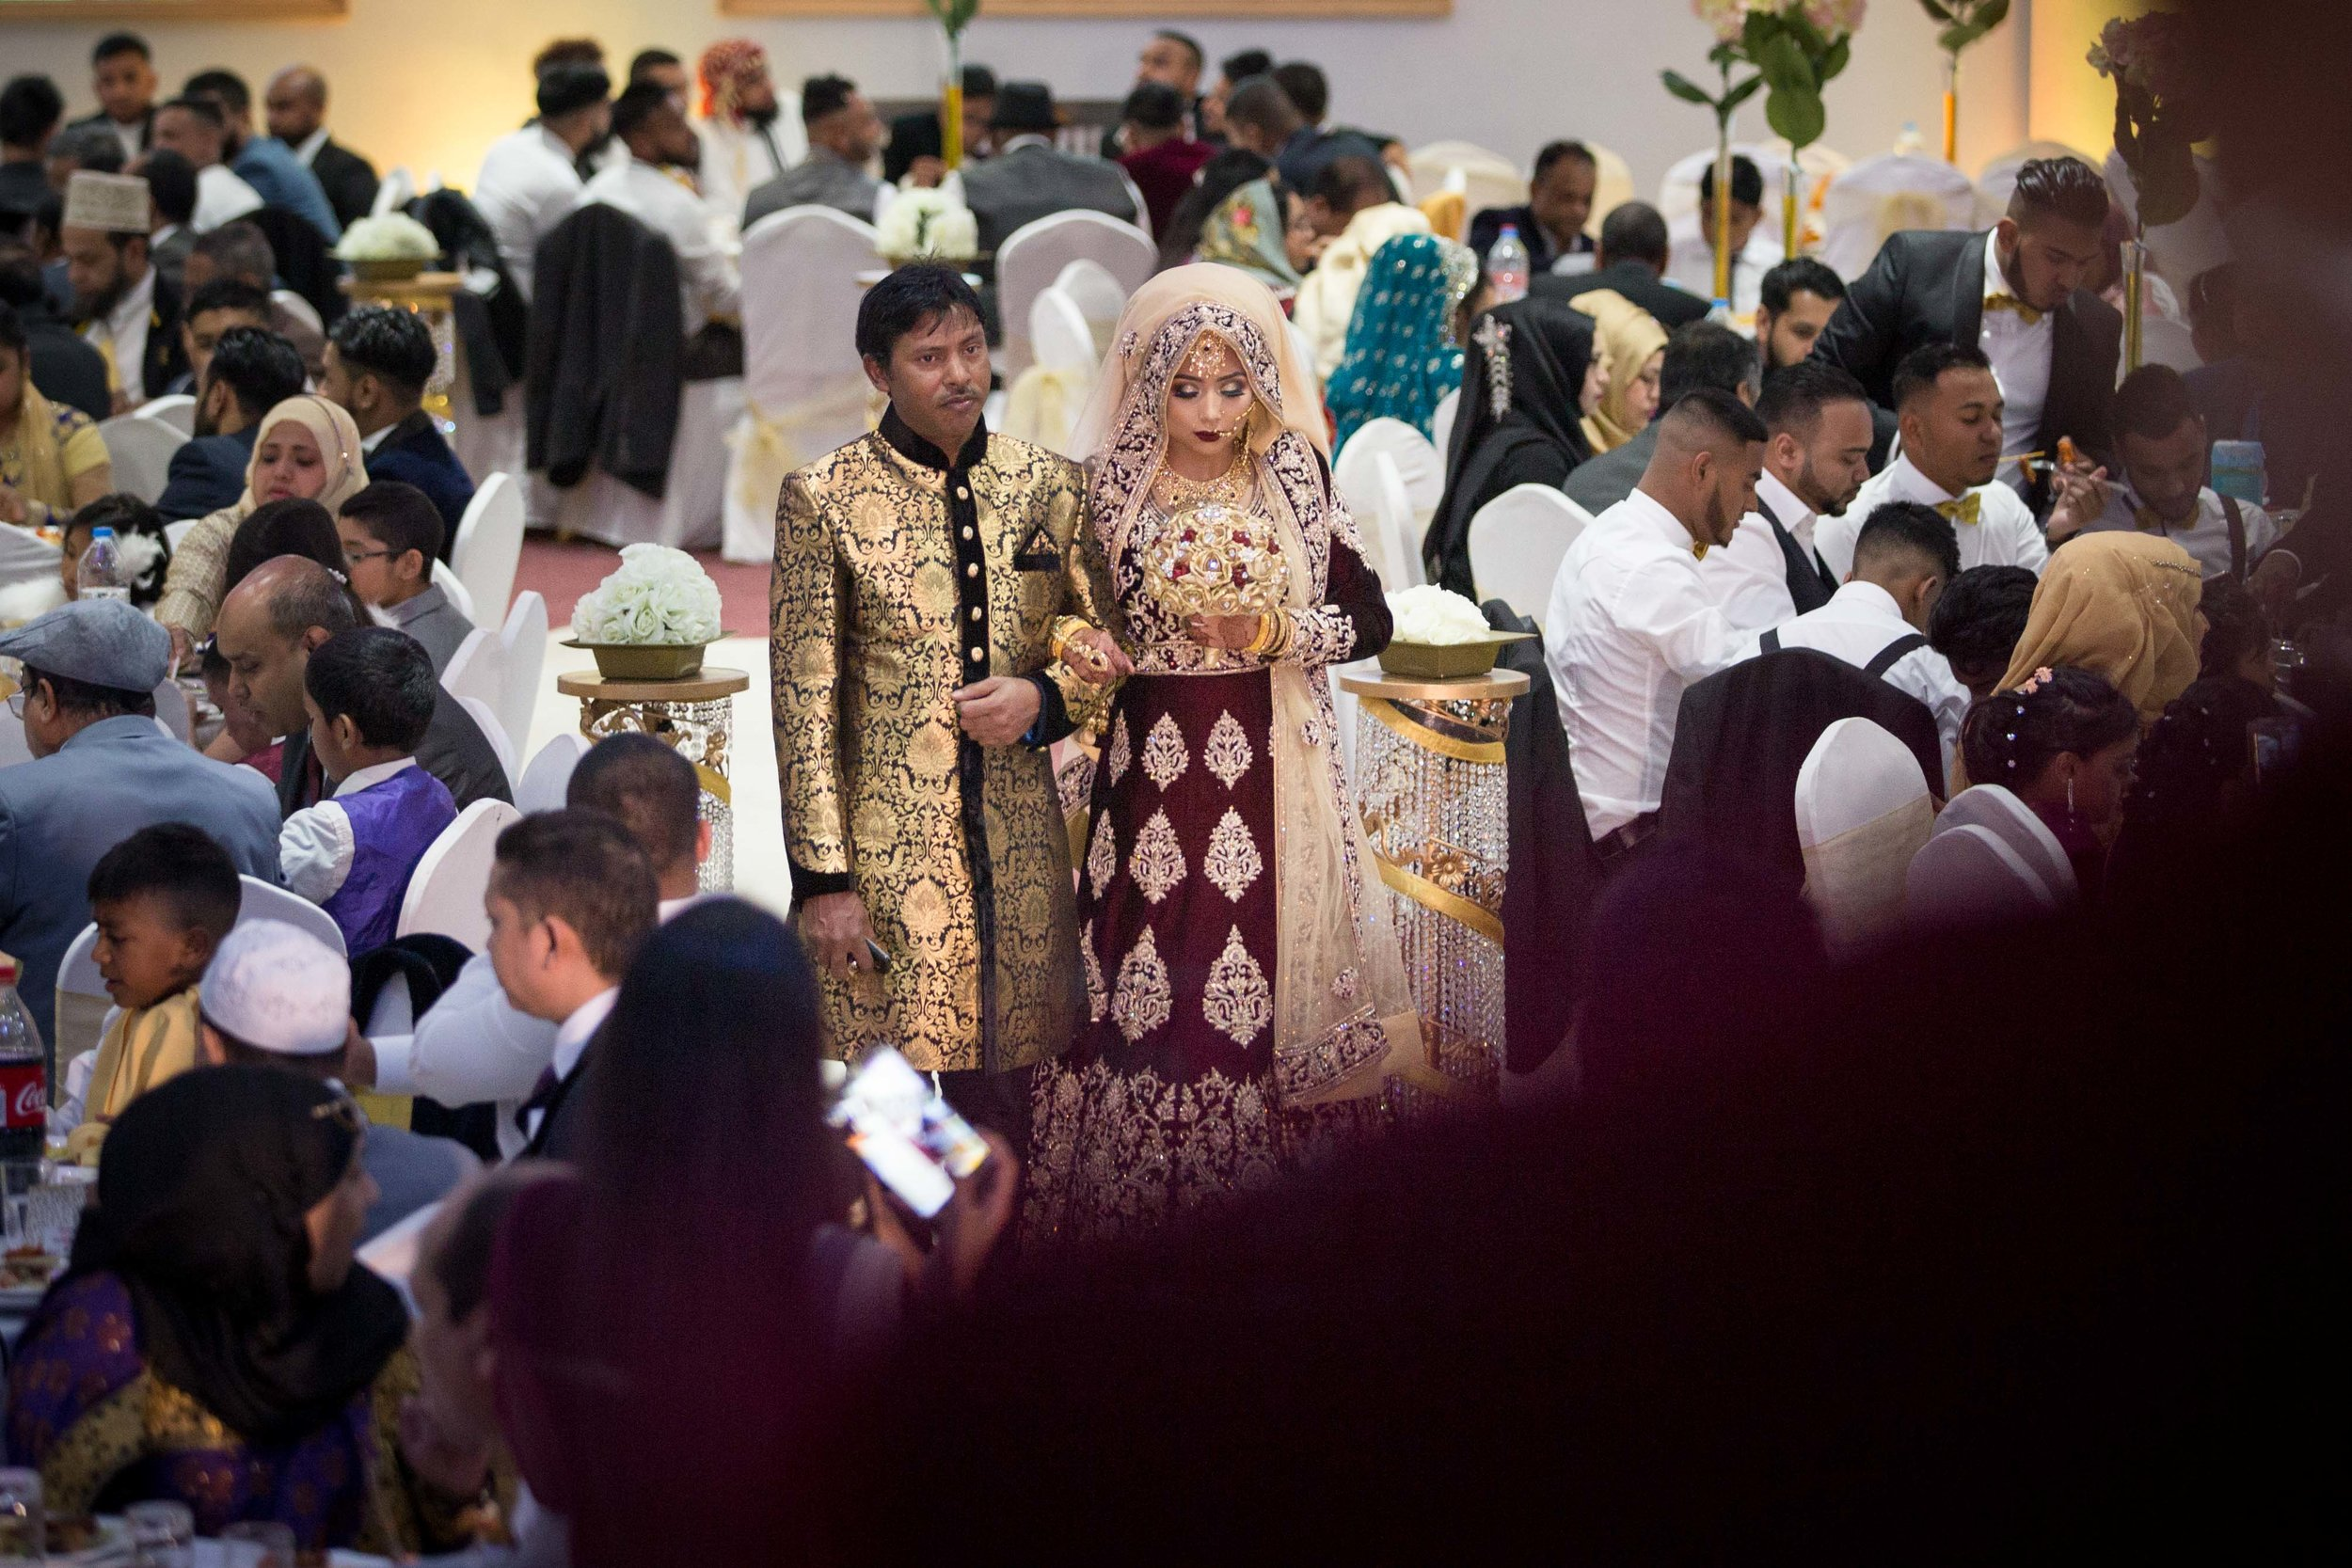 Female-Asian-Piccadilly-banqueting-suite-Wedding-Photographer-Birmingham-natalia-smith-photography-20.jpg